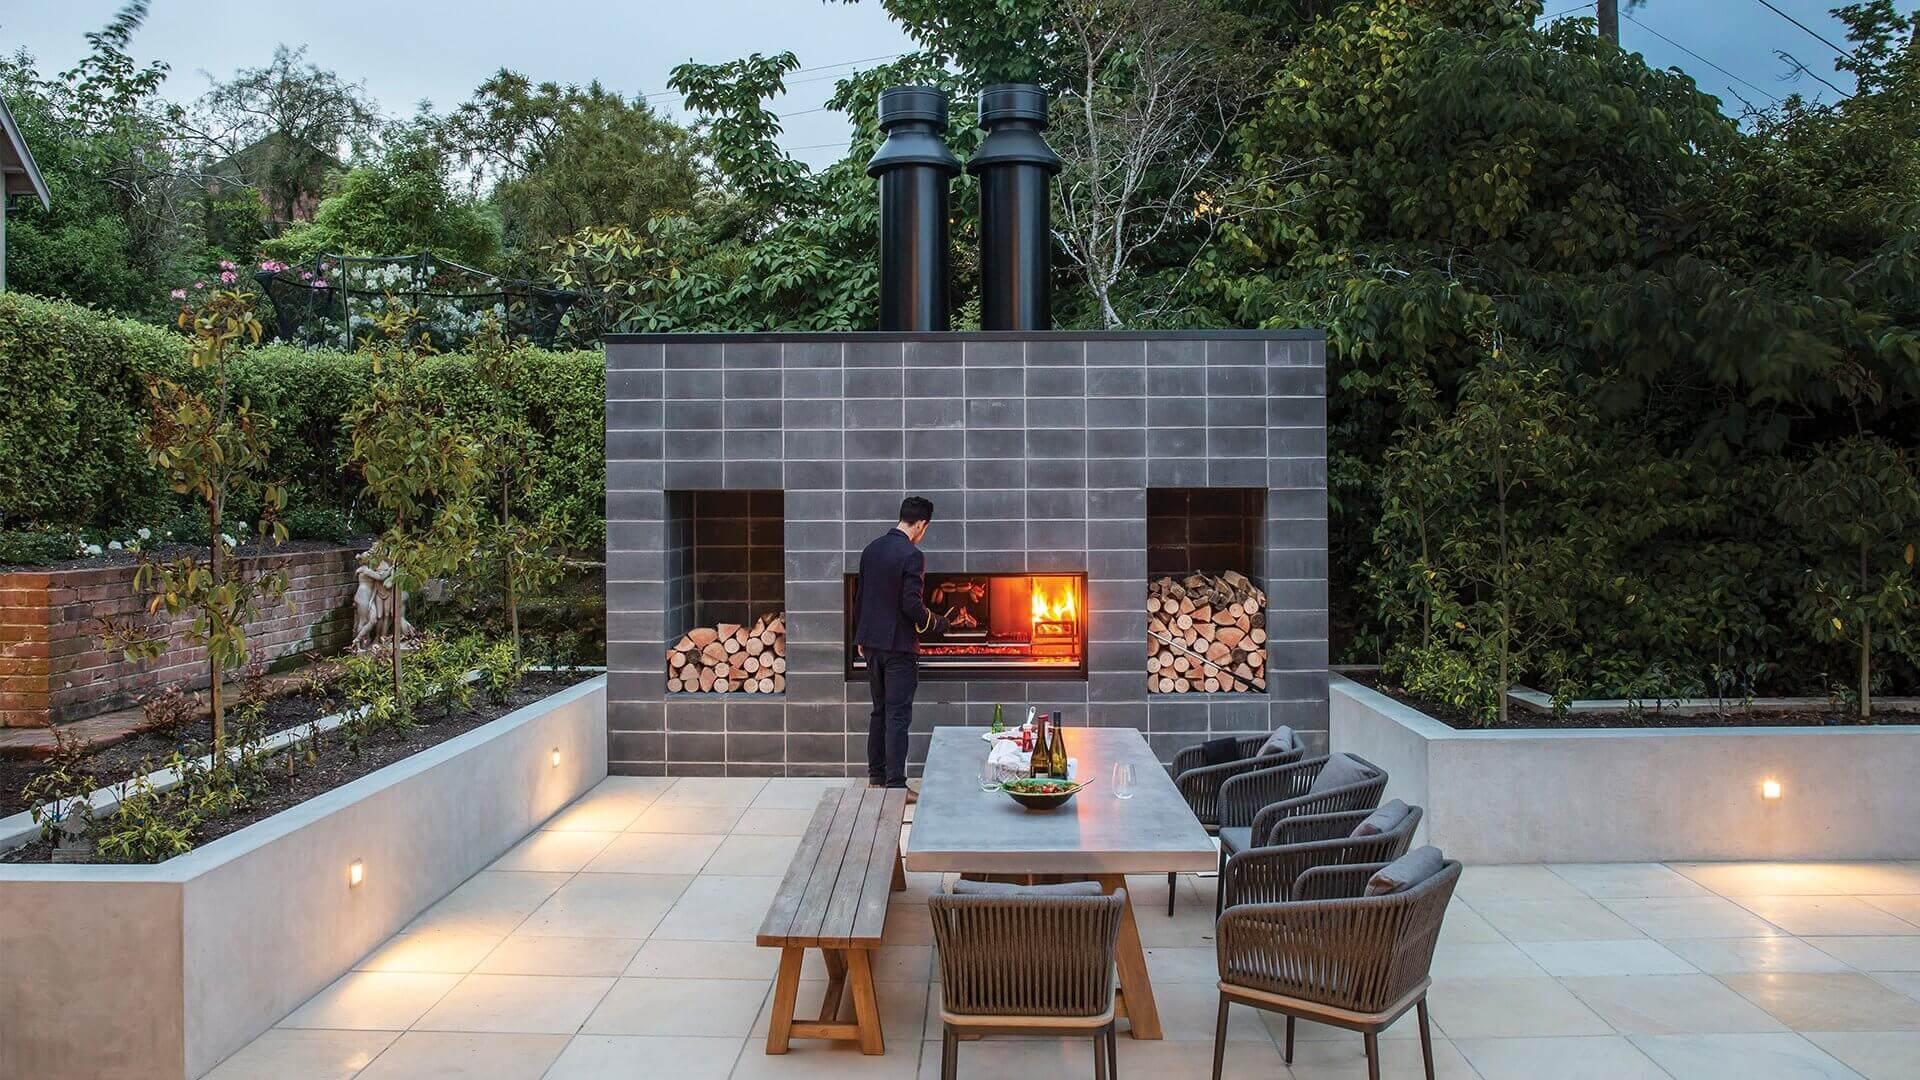 Render of man using outdoor wood heater on external patio